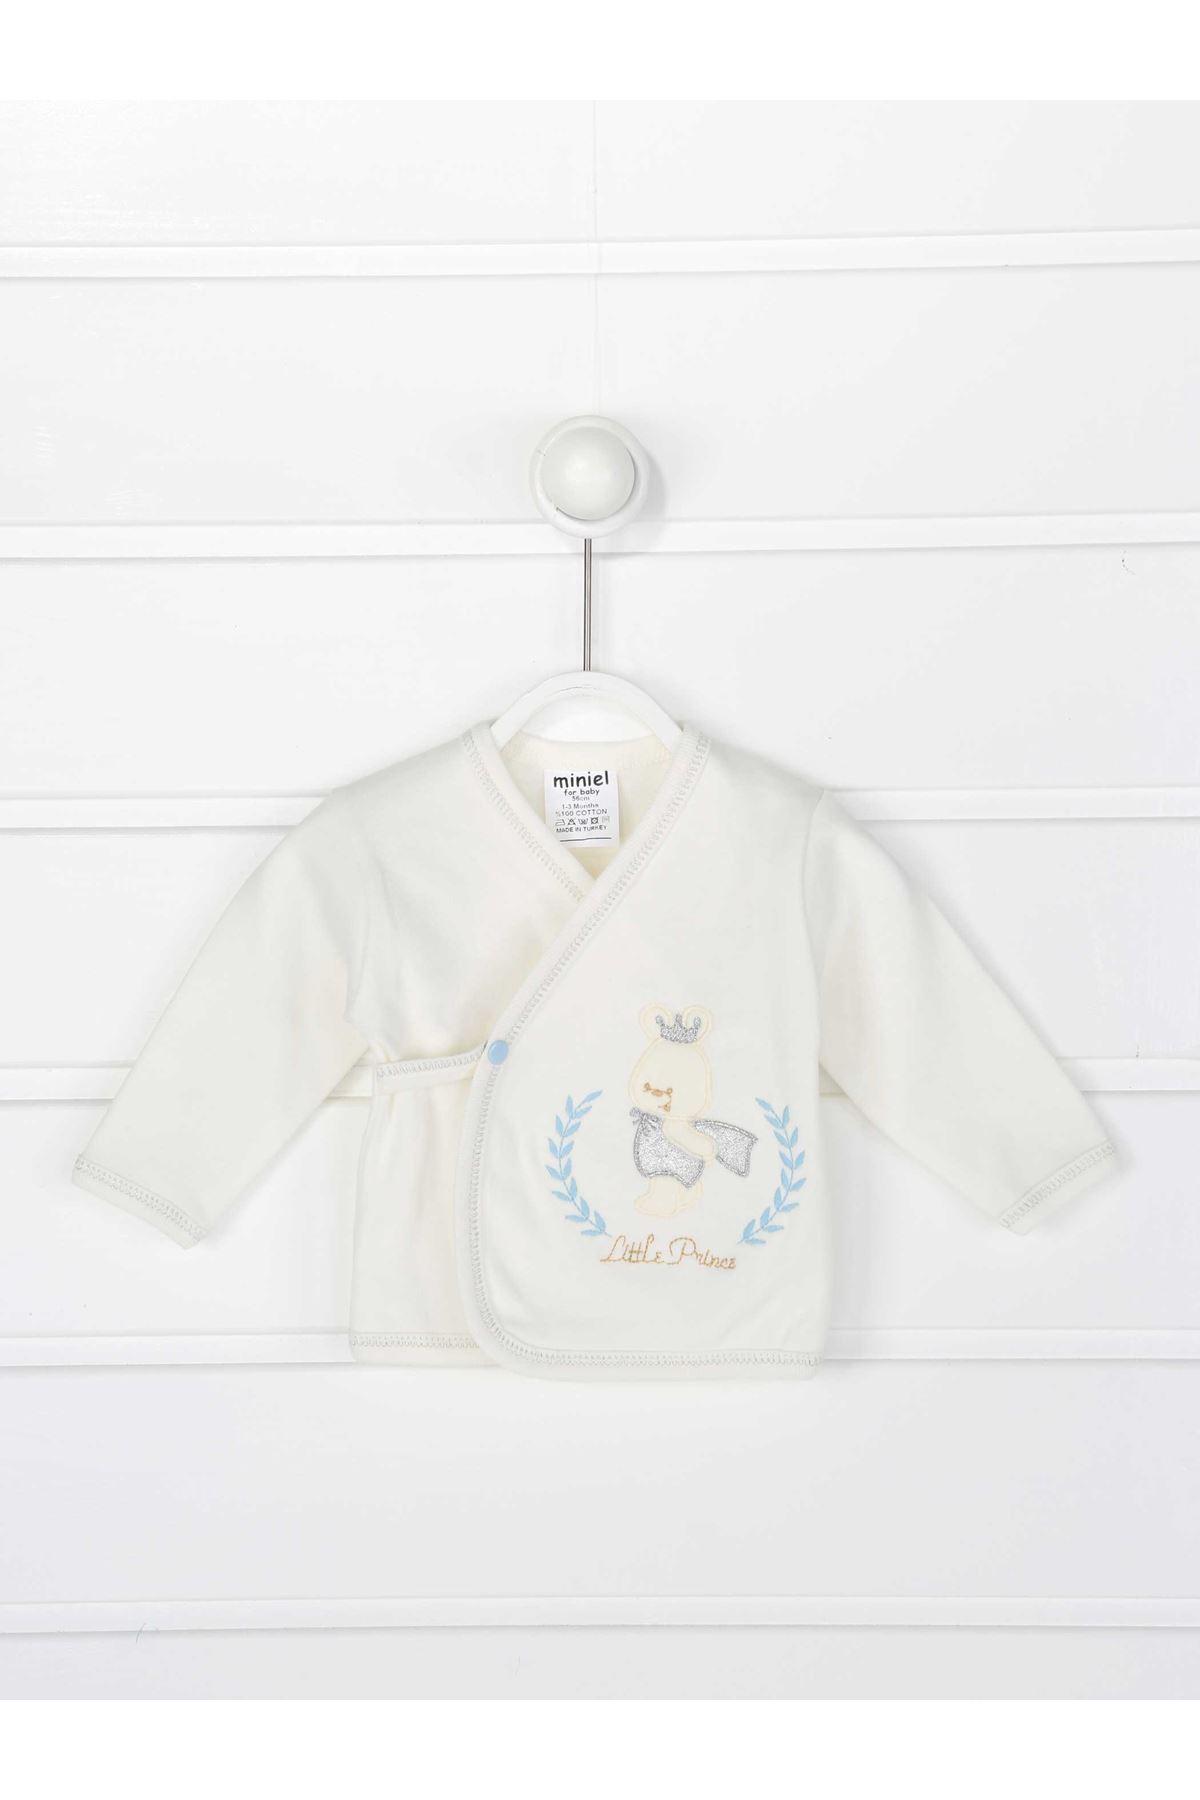 Blue Newborn Baby Boy 5 piece suit set cotton Gentleman Princess Hospital Outlet daily casual Boys Babies clothes style fashion